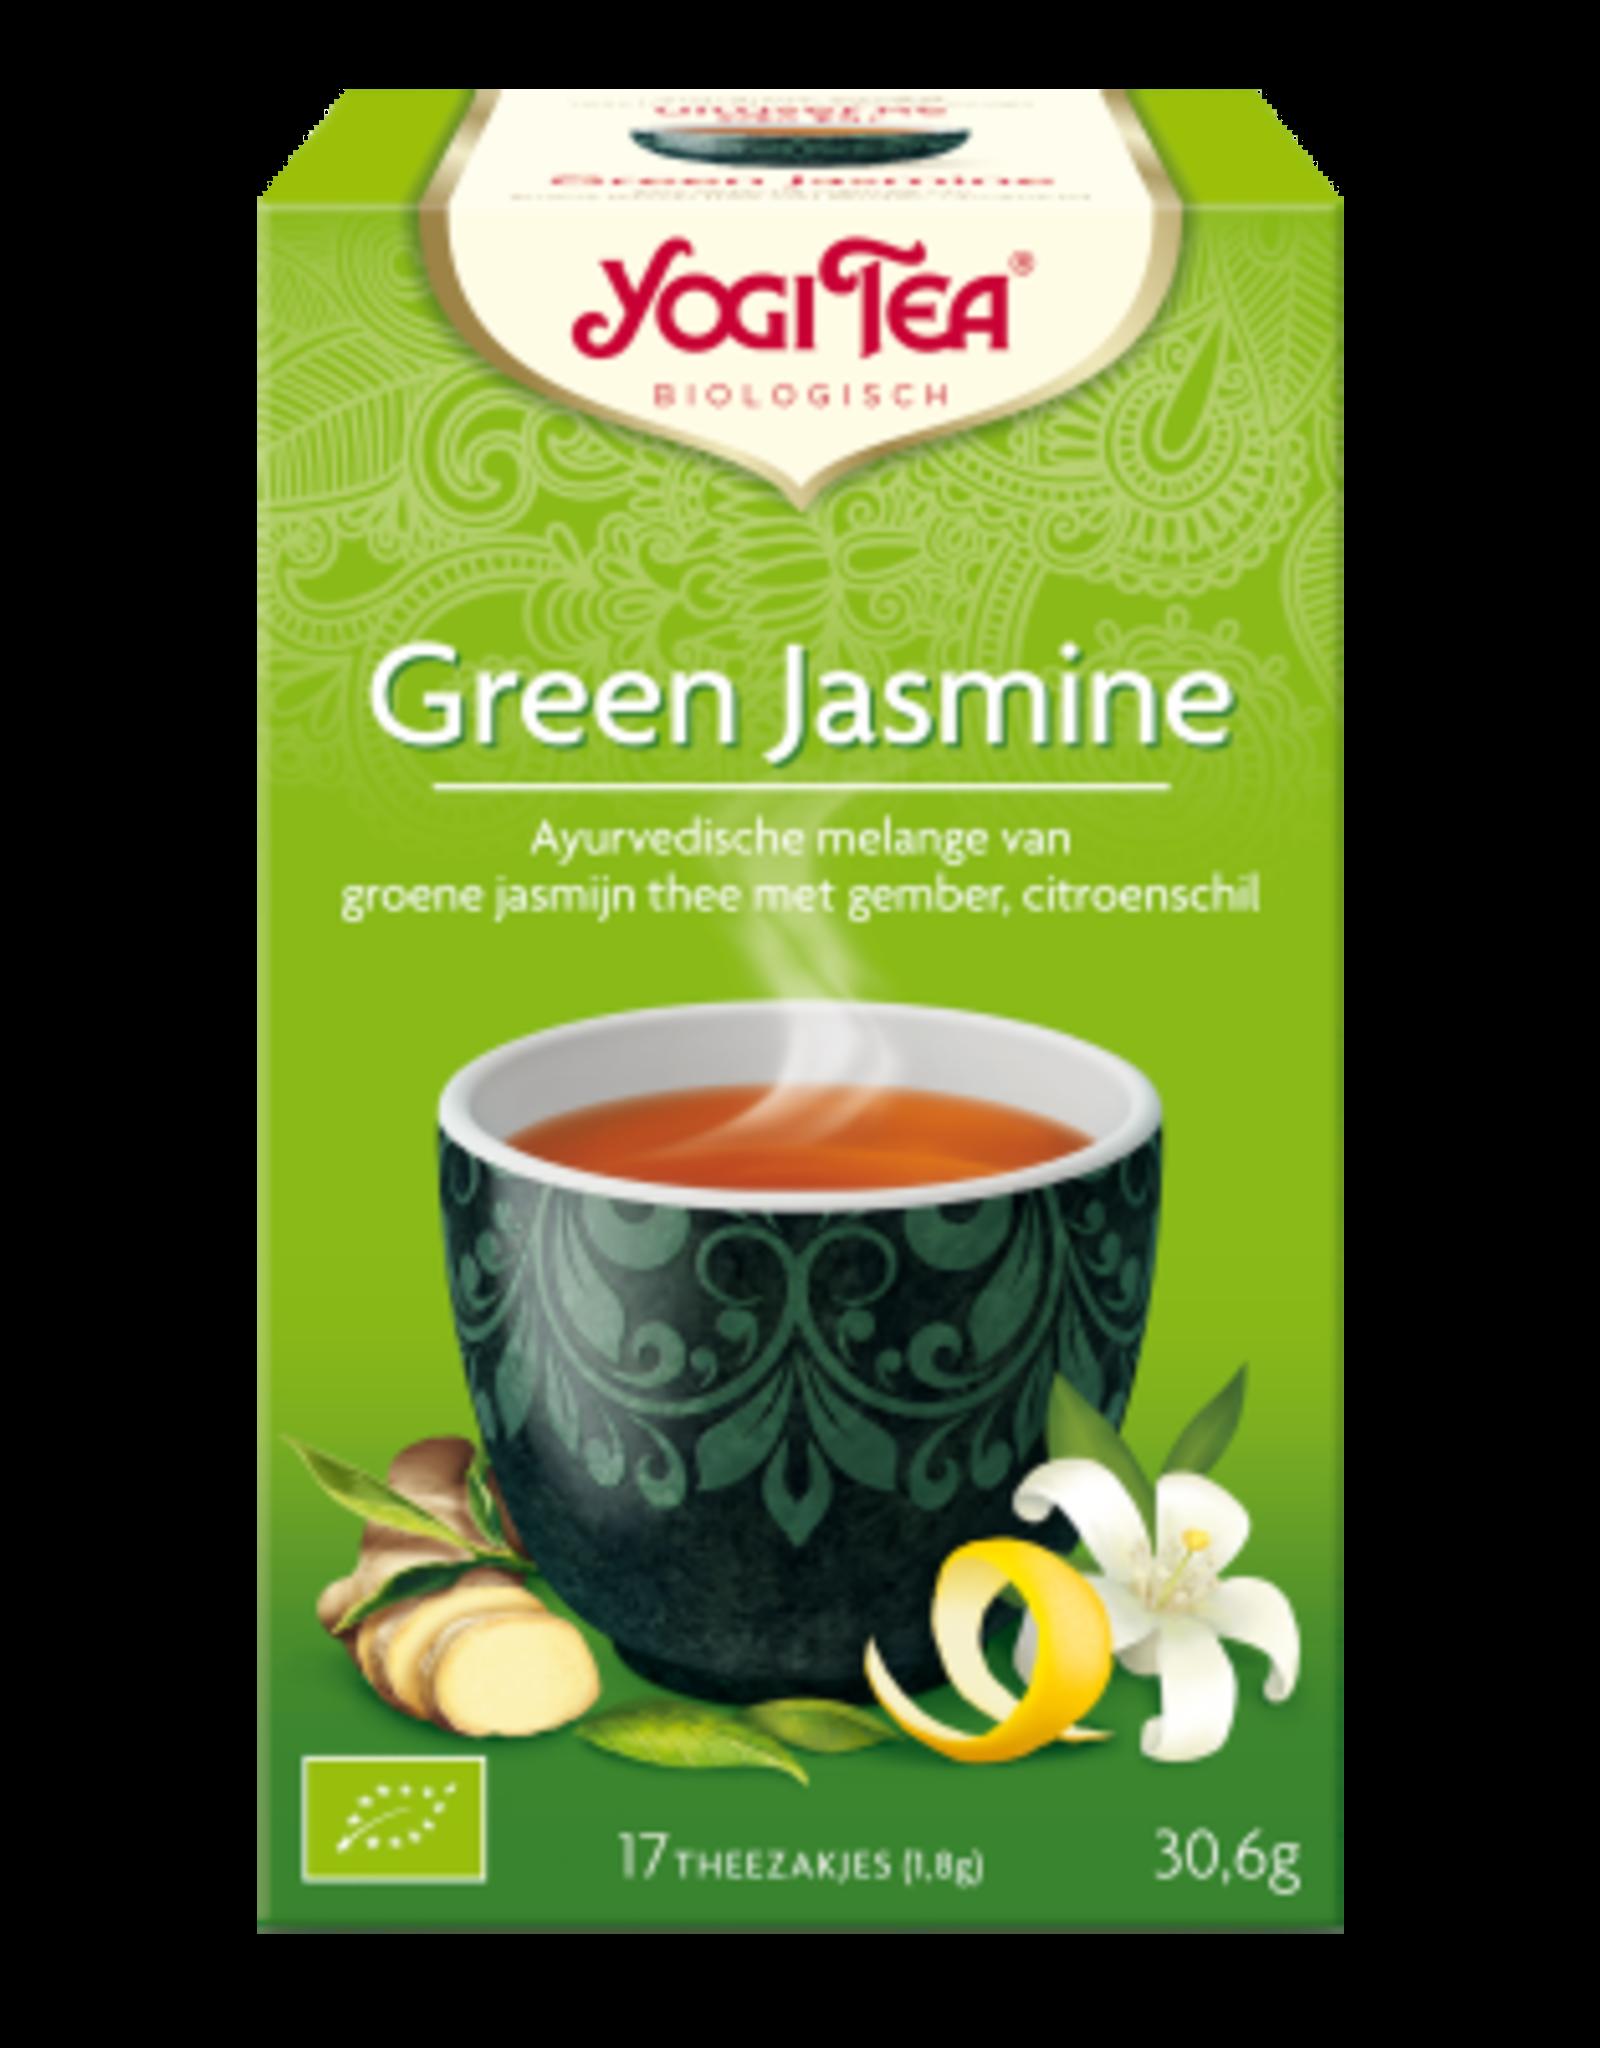 Yogi Tea Yogi Tea Green Jasmine